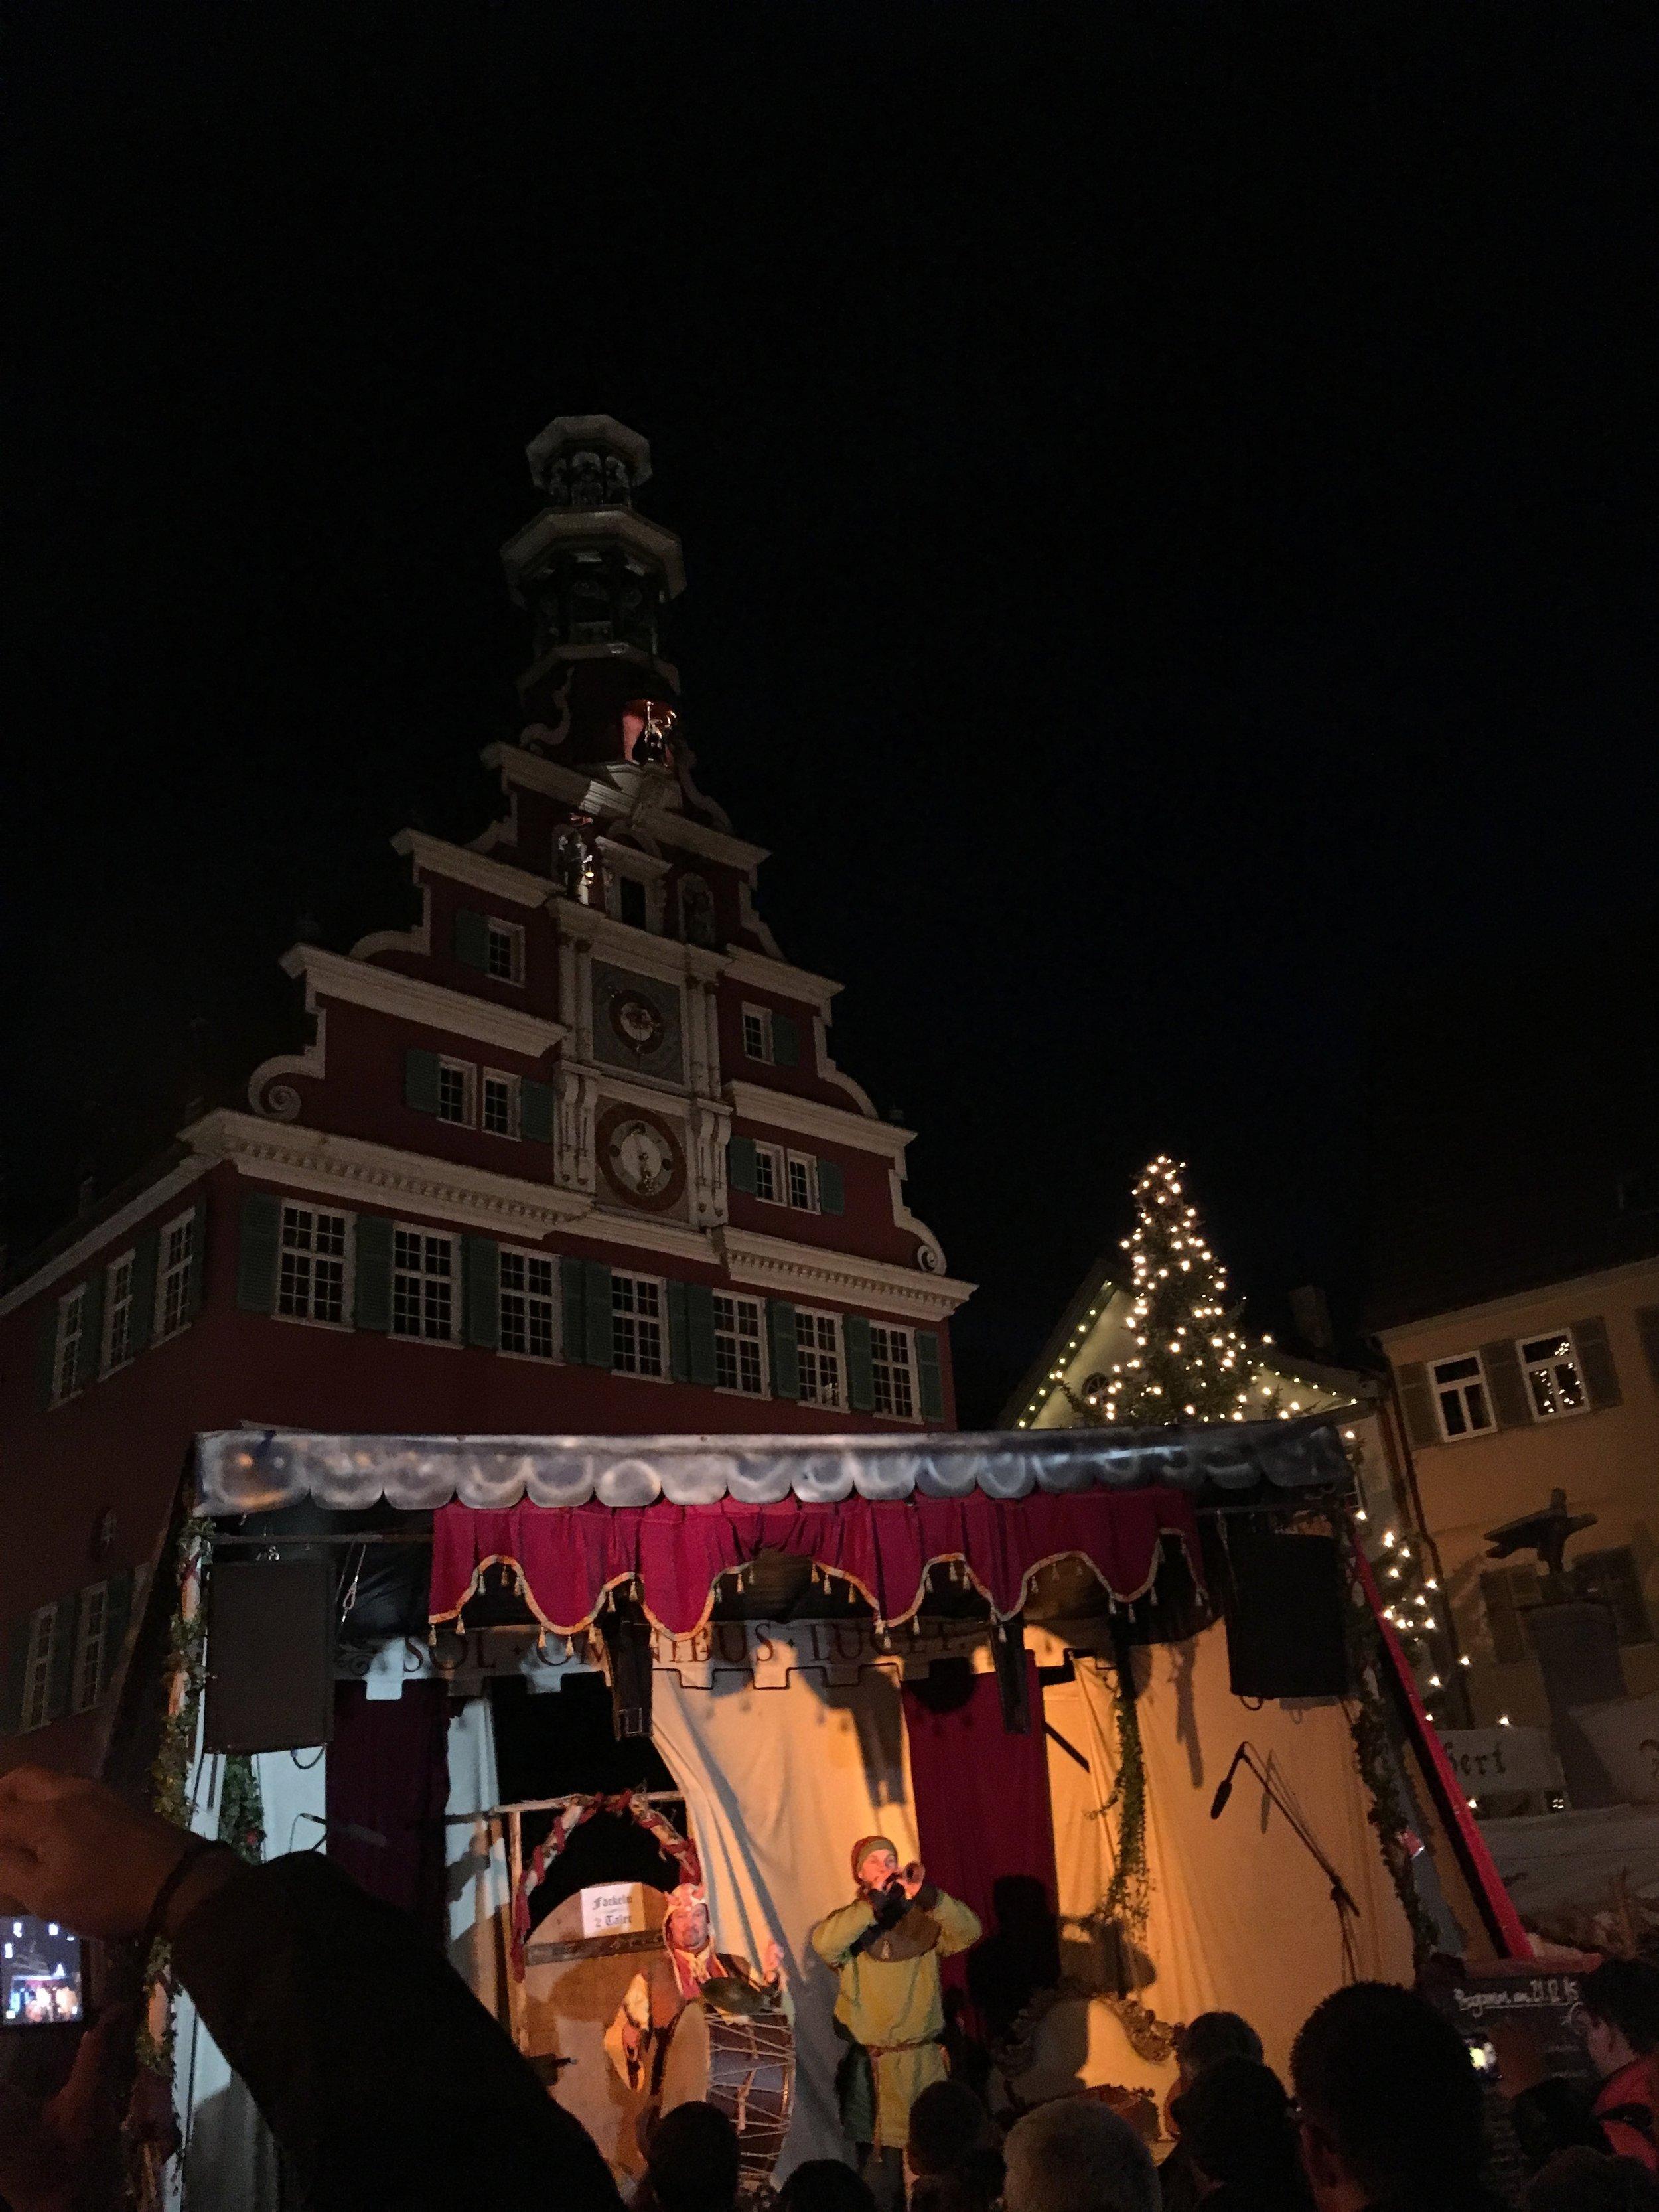 The Esslingen Middle Ages Market 2015